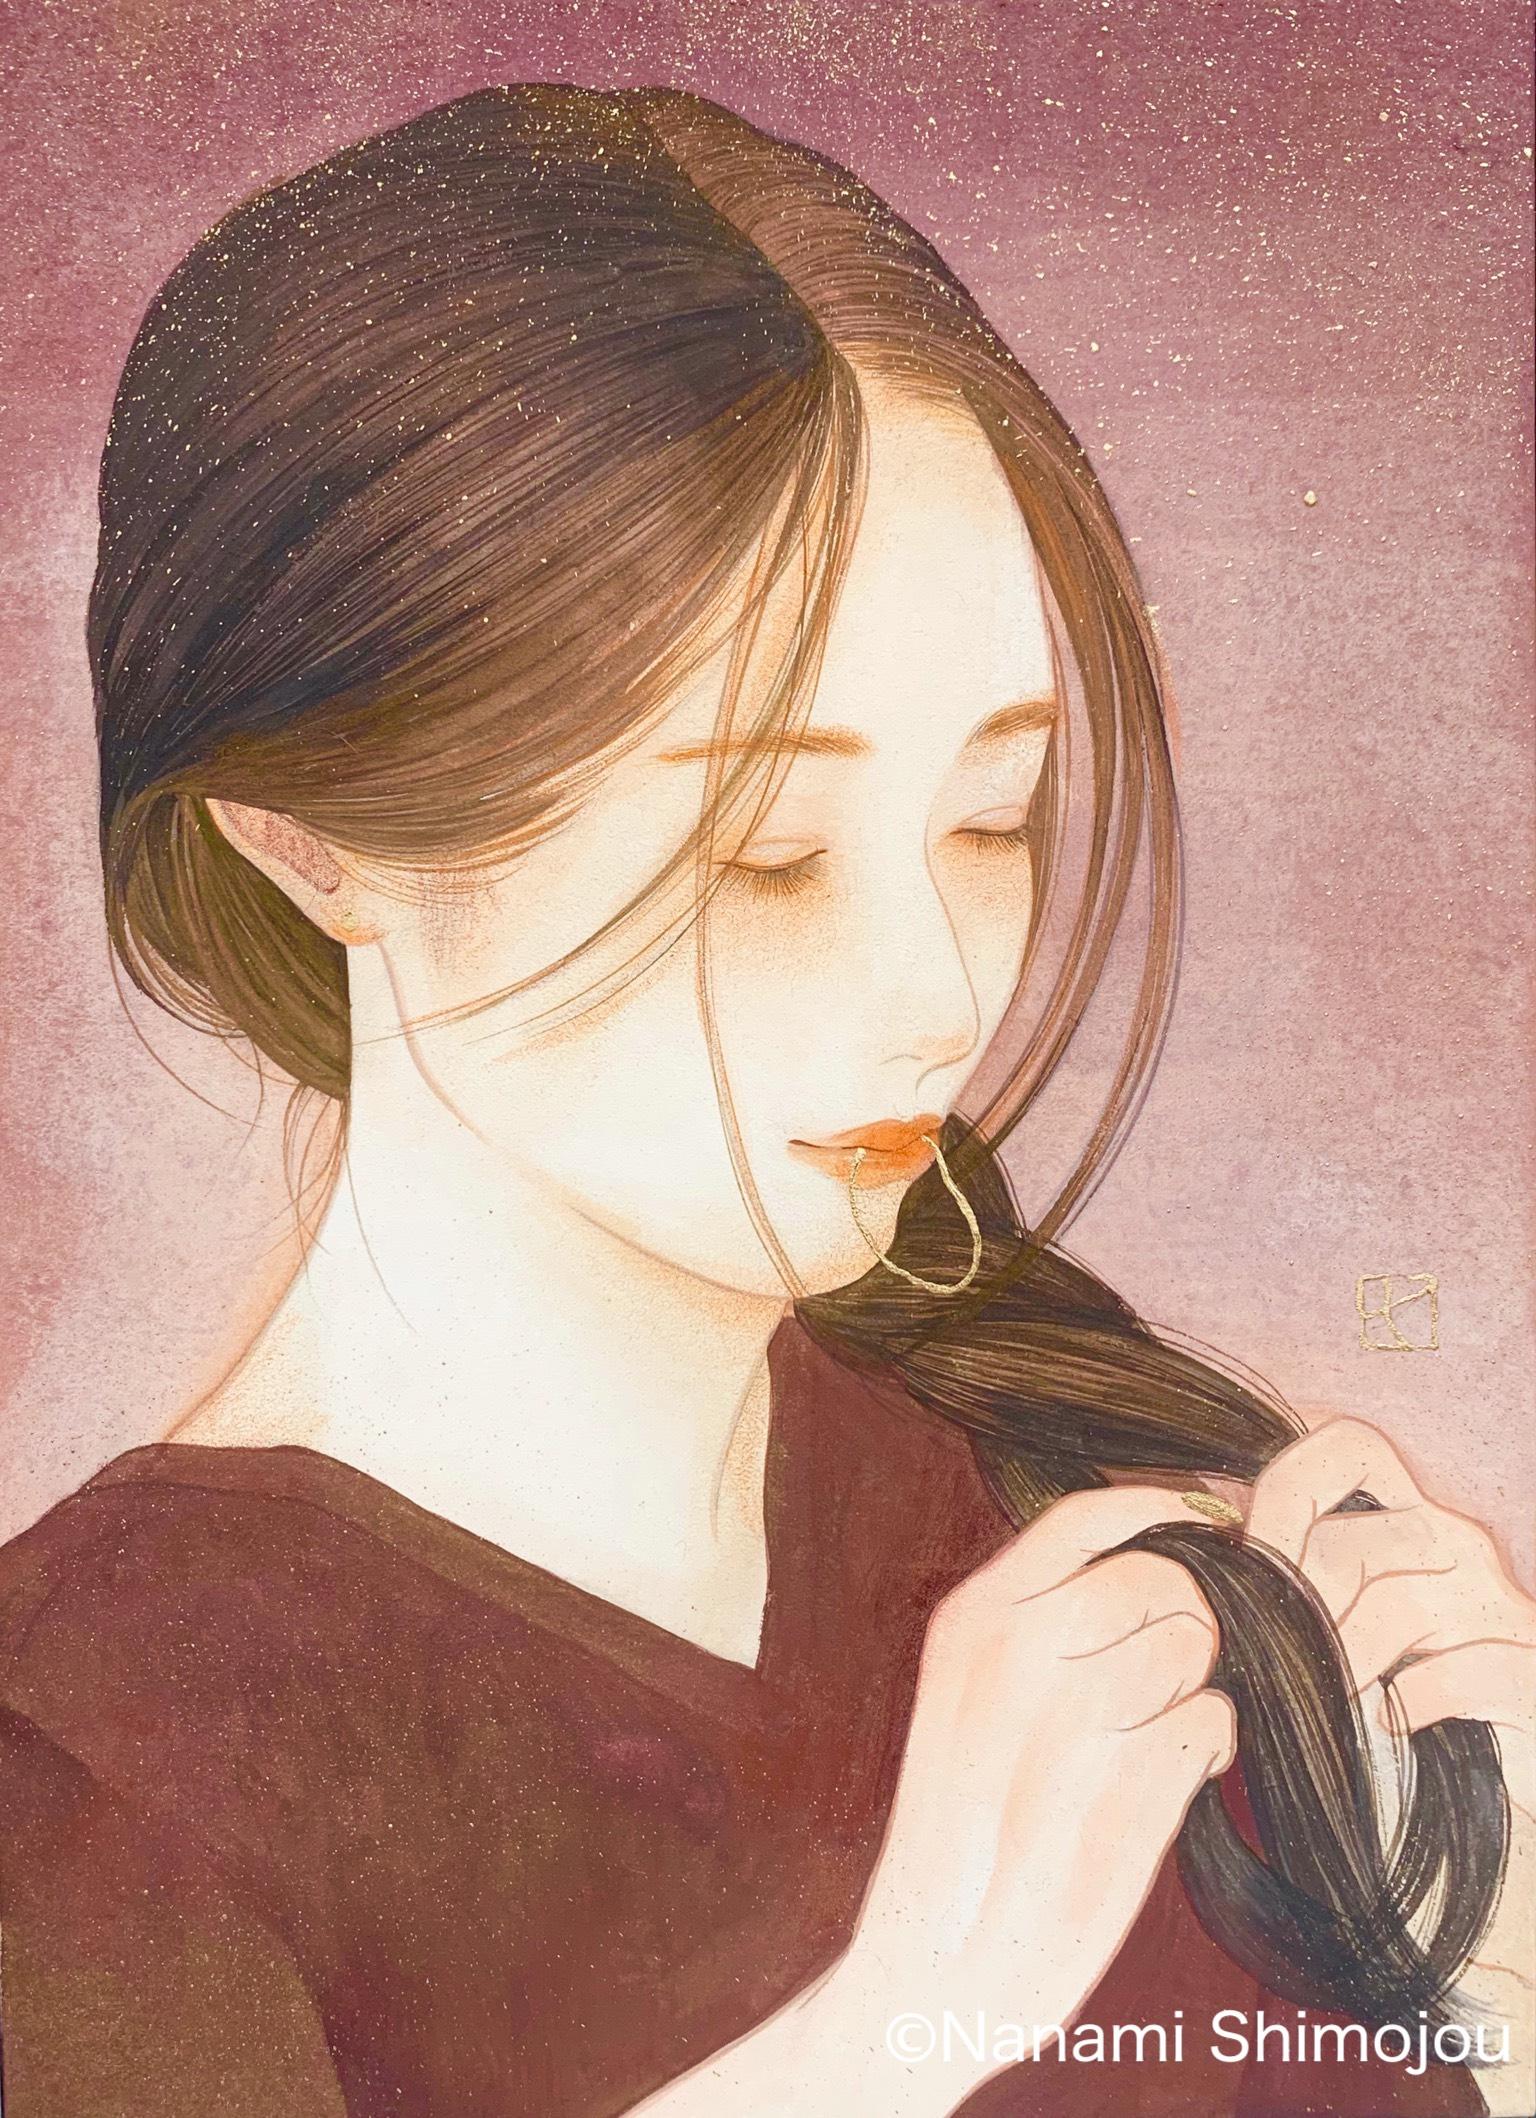 Nanami Shimojou_Autumn wind - braid -.jpeg